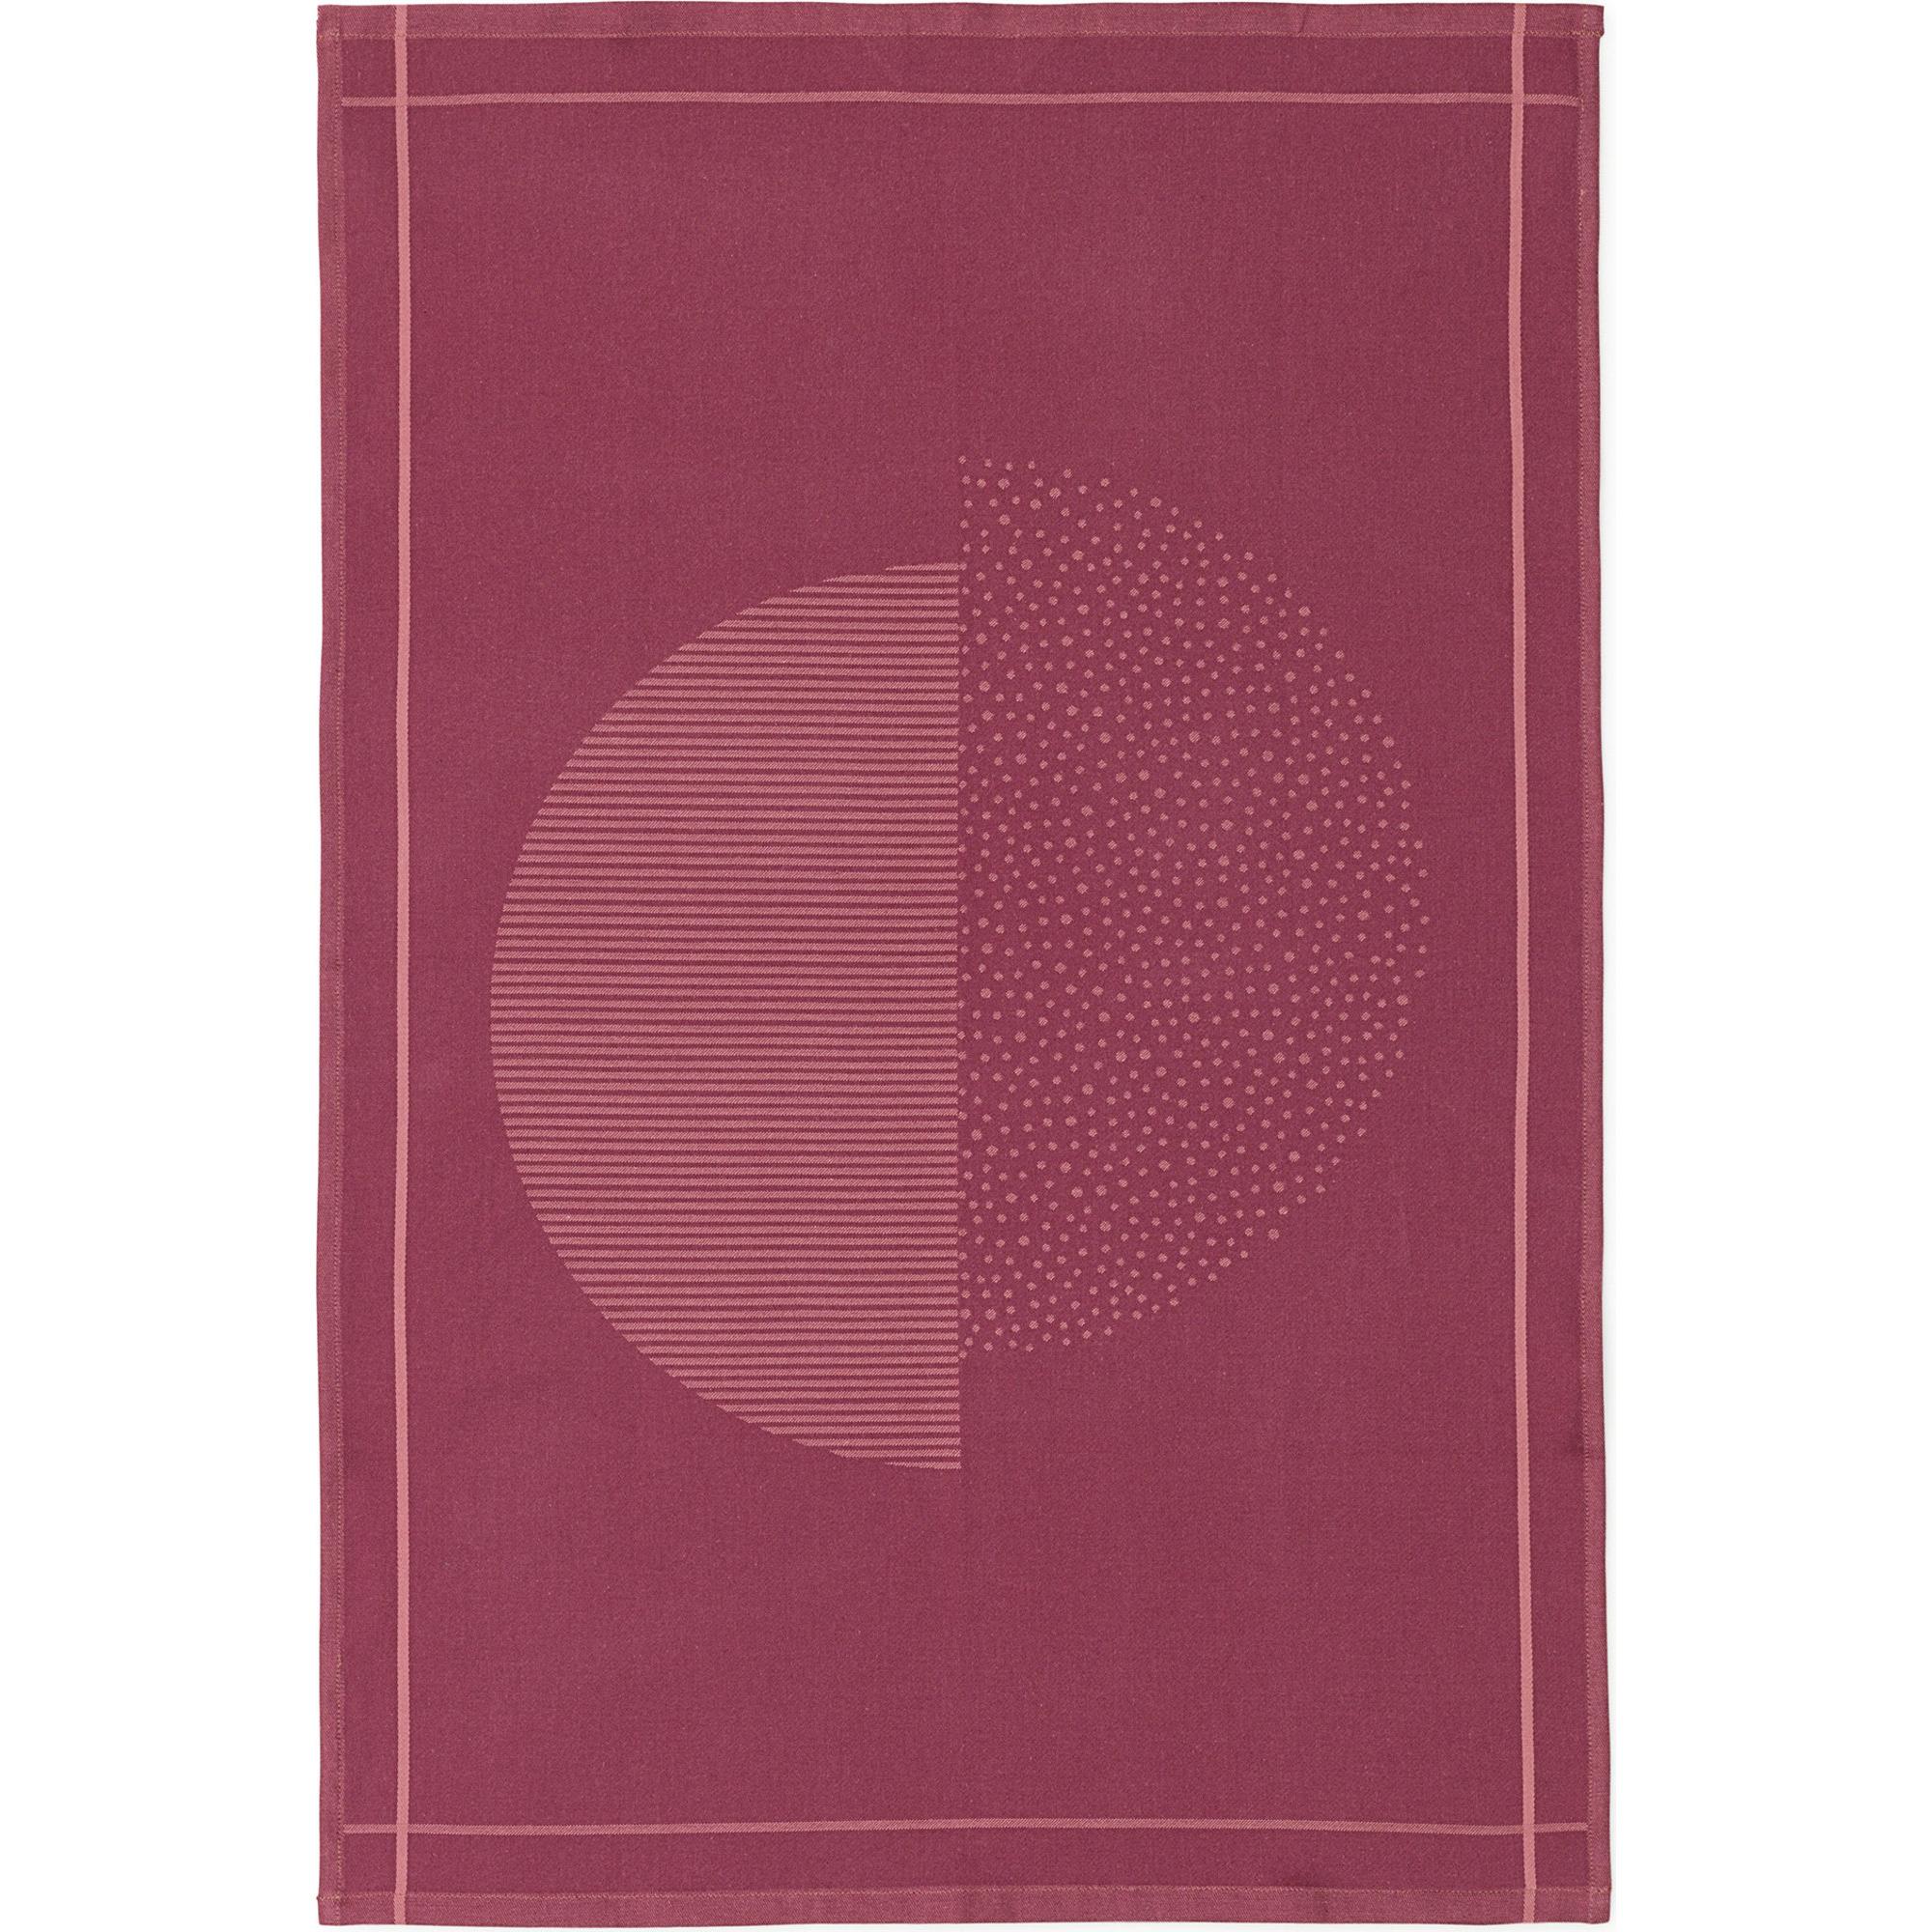 Normann Copenhagen Illusion Tea Towel Burgundy